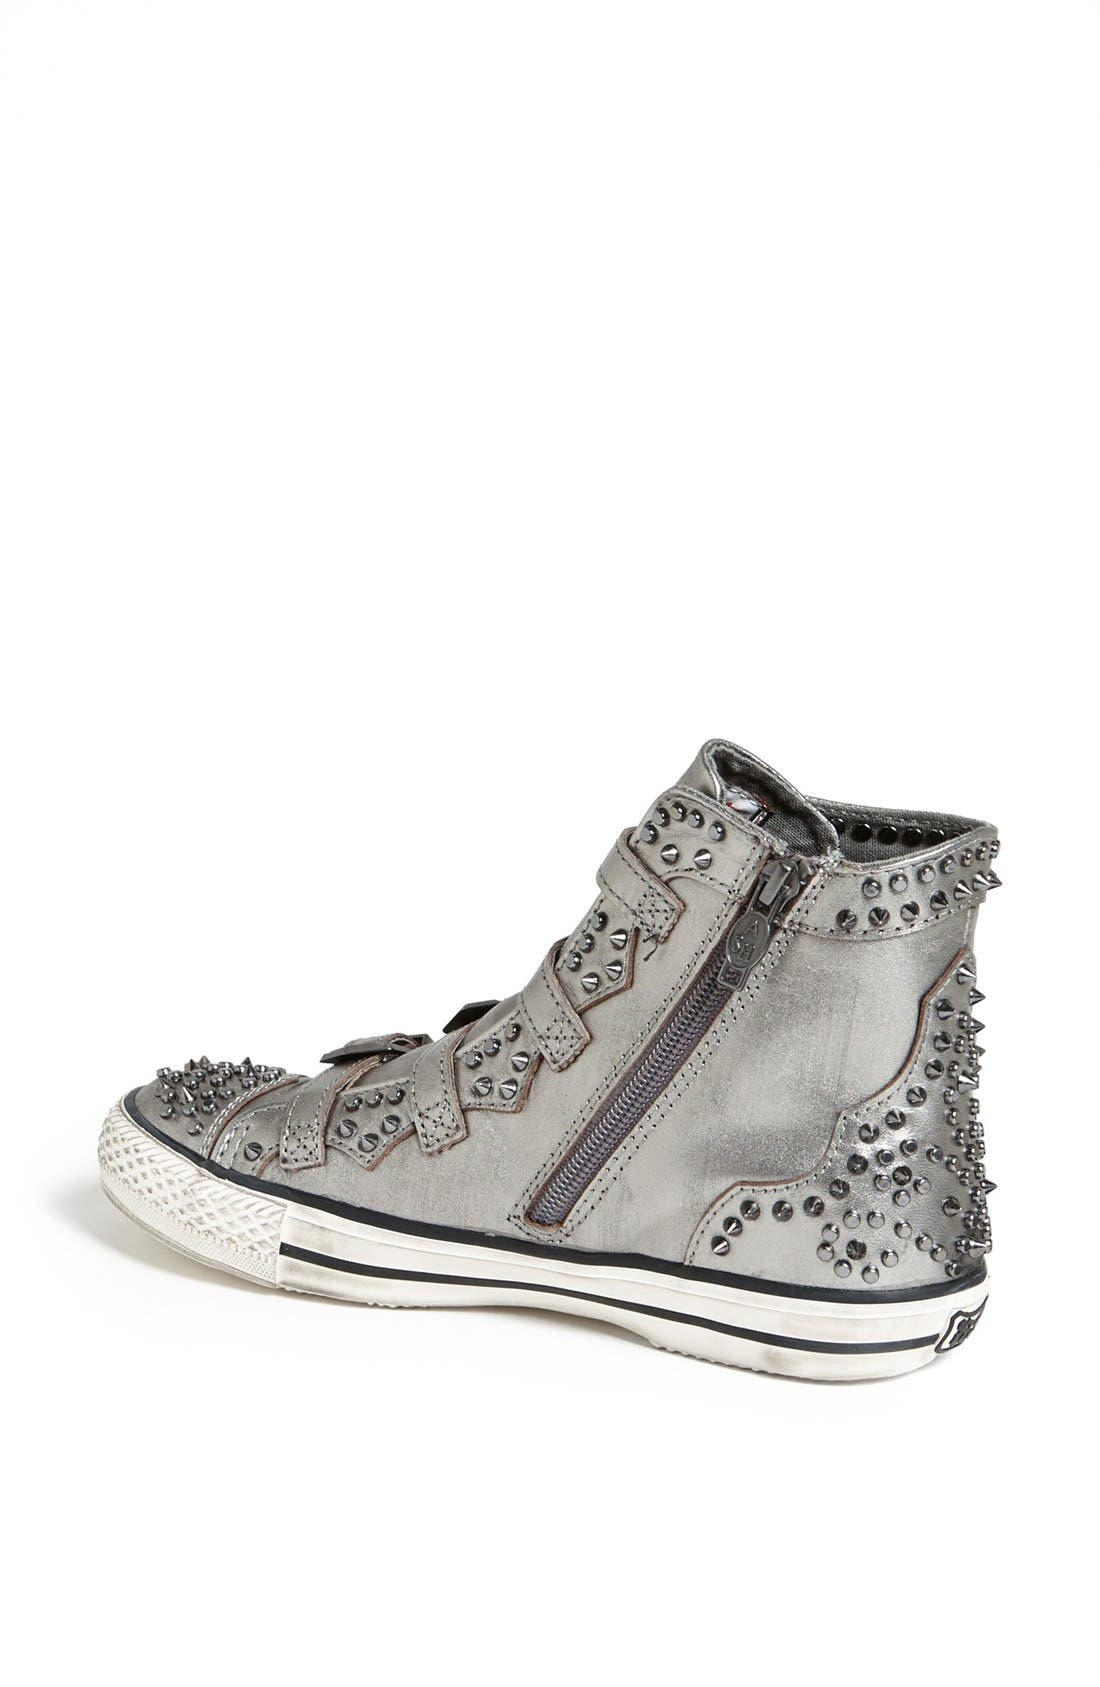 Alternate Image 2  - Ash 'Viking' Spiked Metallic Leather Sneaker